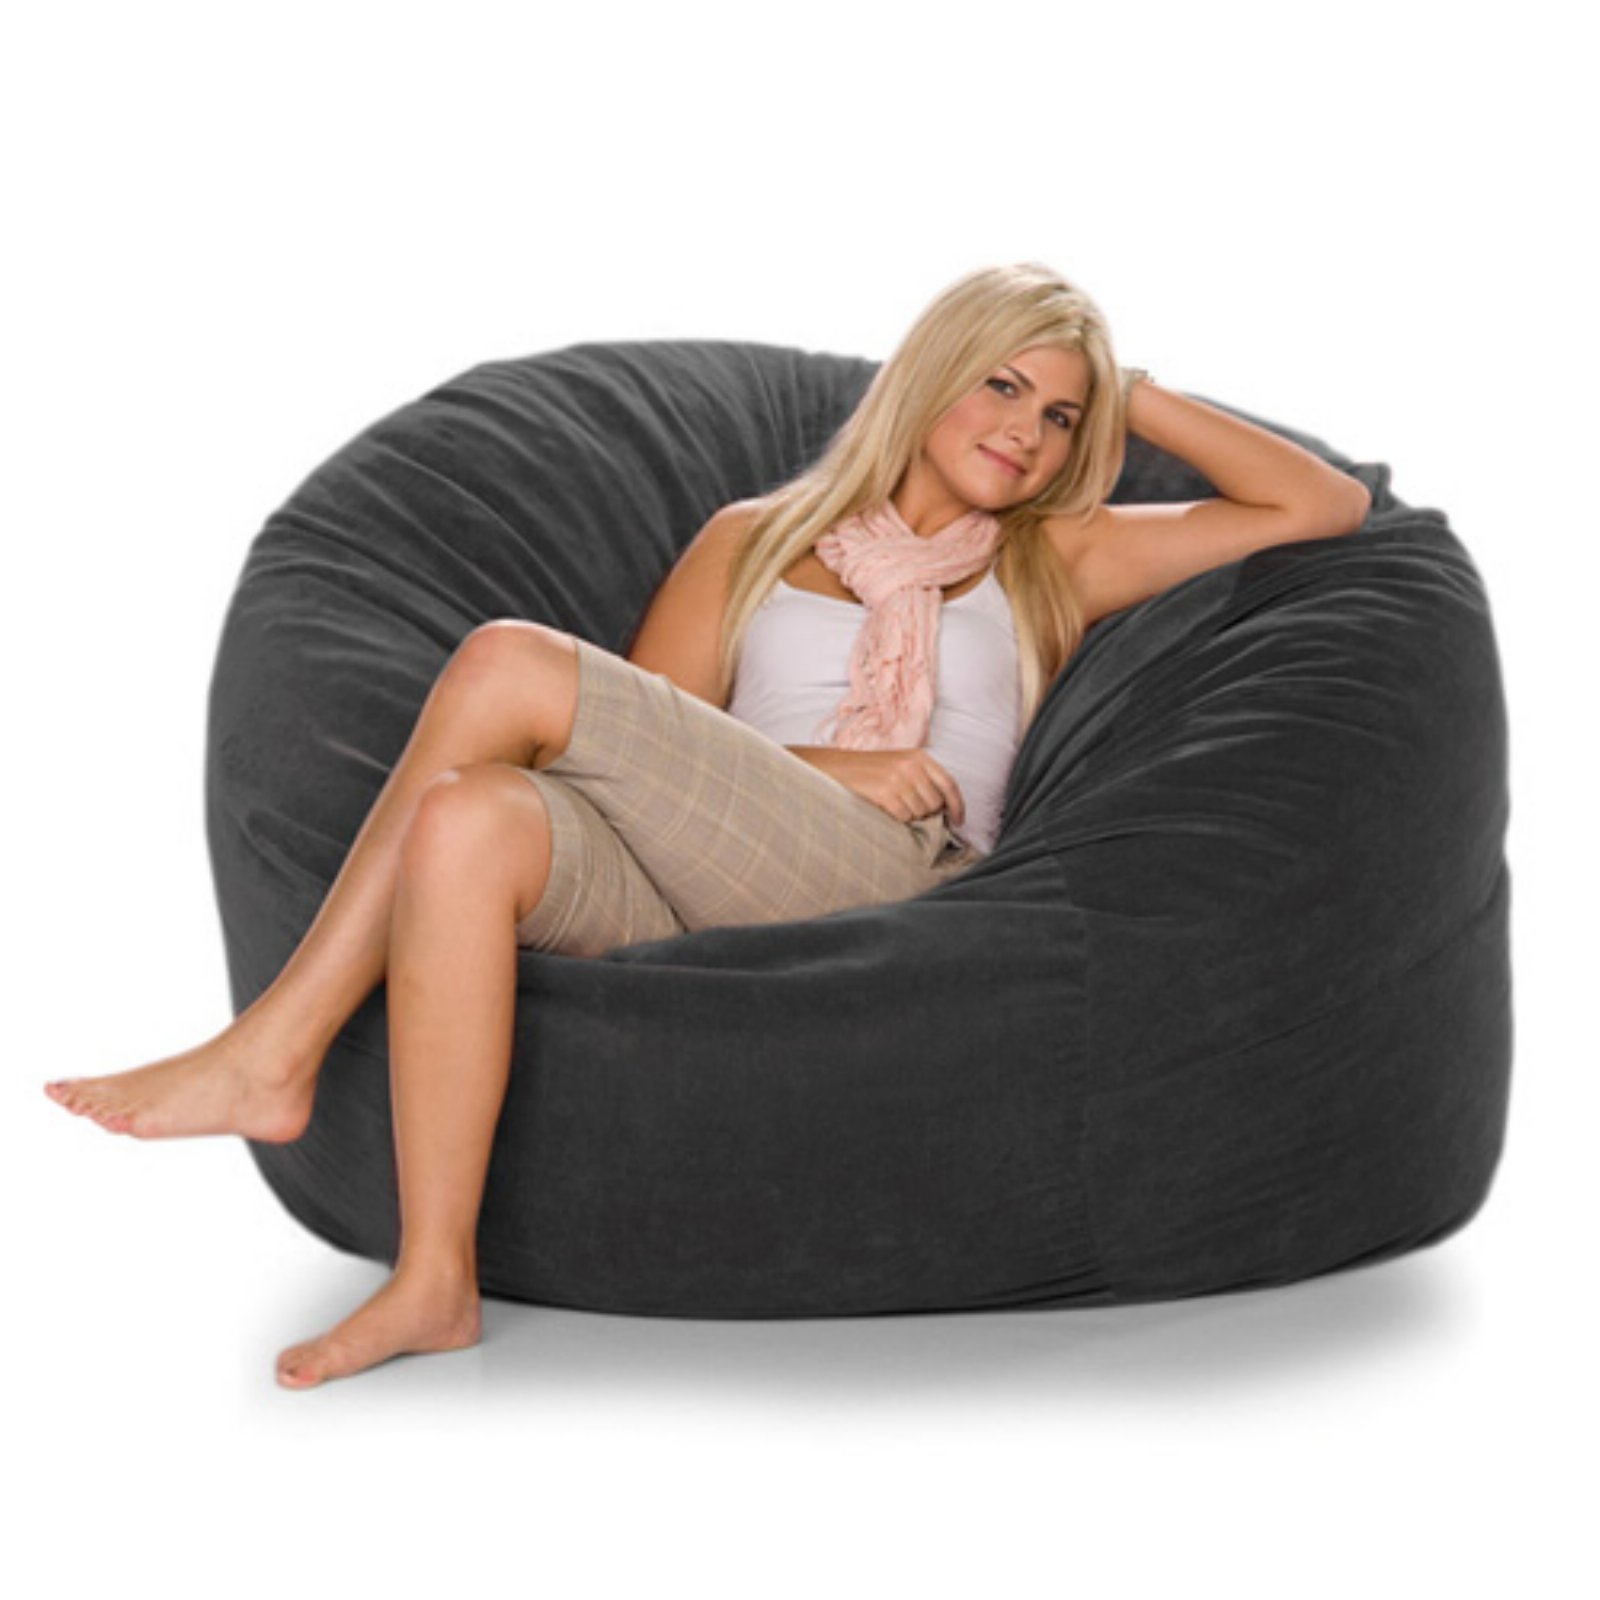 Jaxx Metro Sac - Microsuede Small Foam Sofa